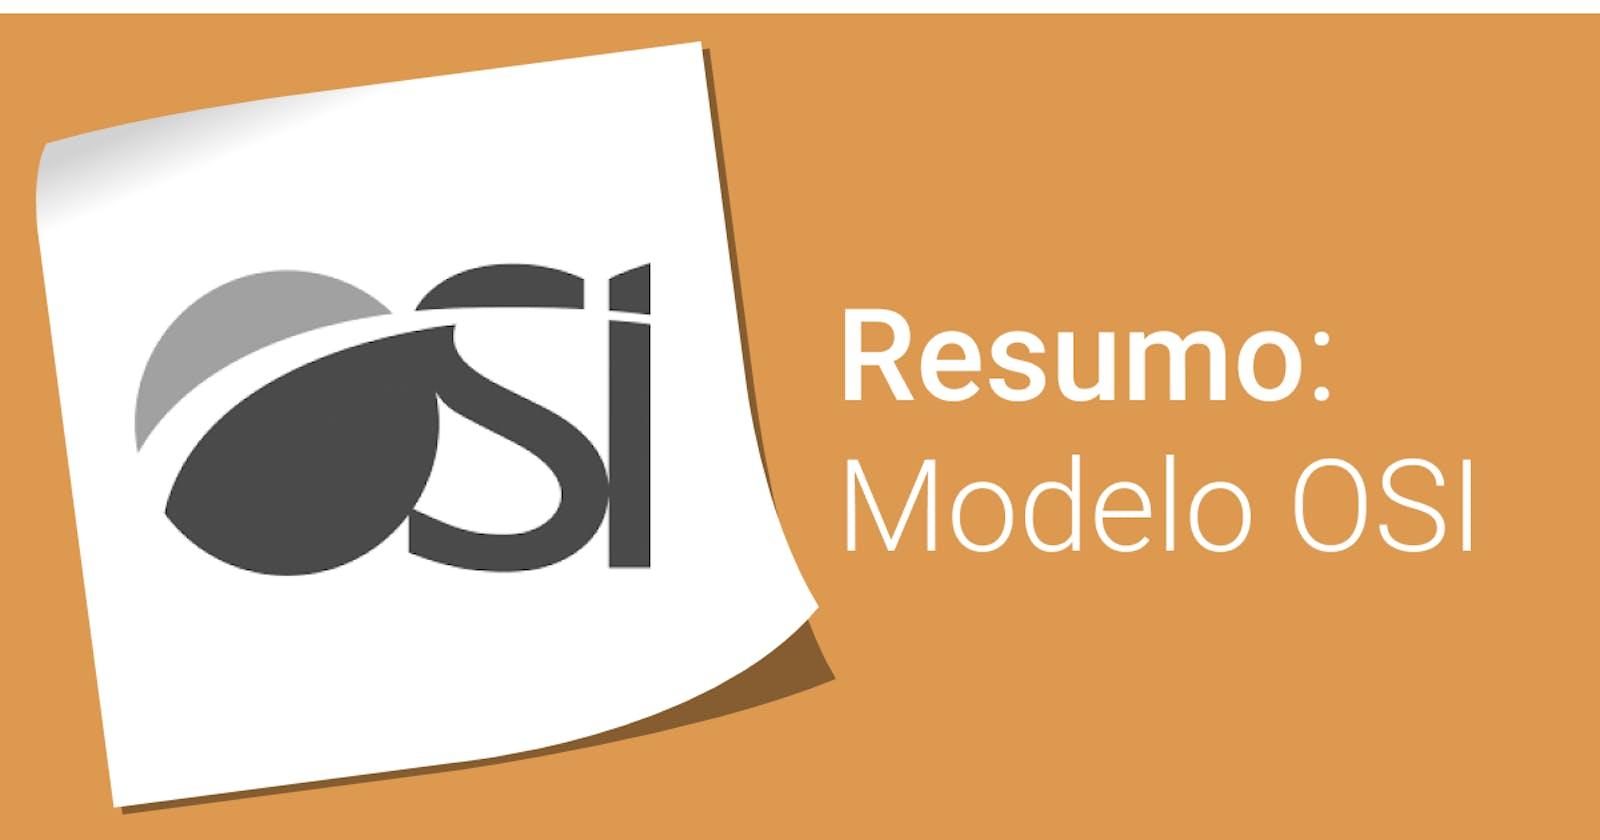 Resumo: Modelo OSI